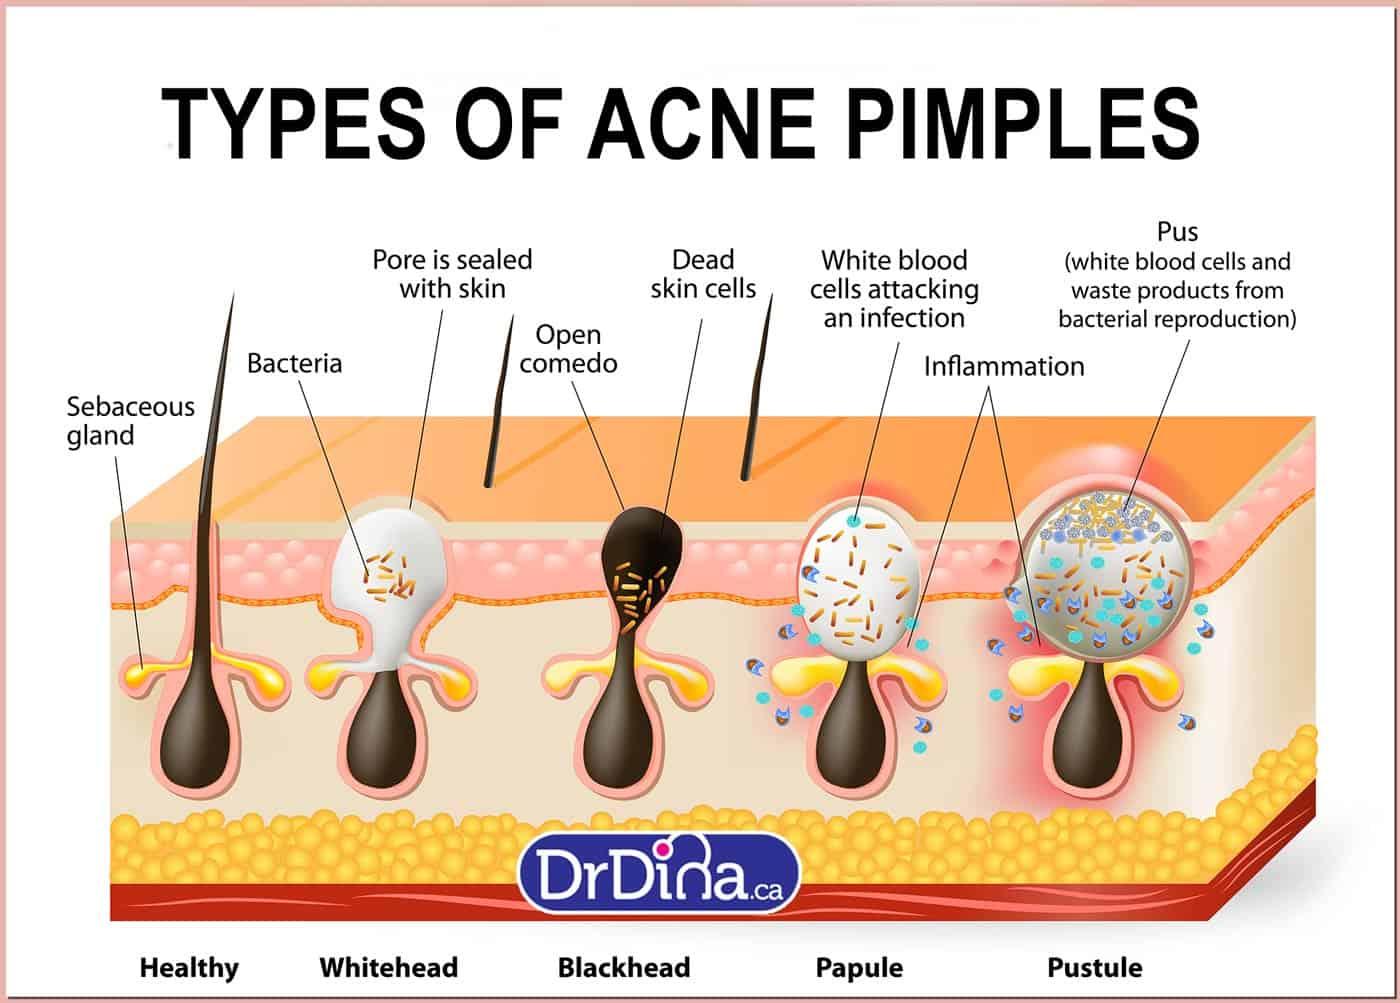 DrDina-Kids-Health-cystic-acne-1a